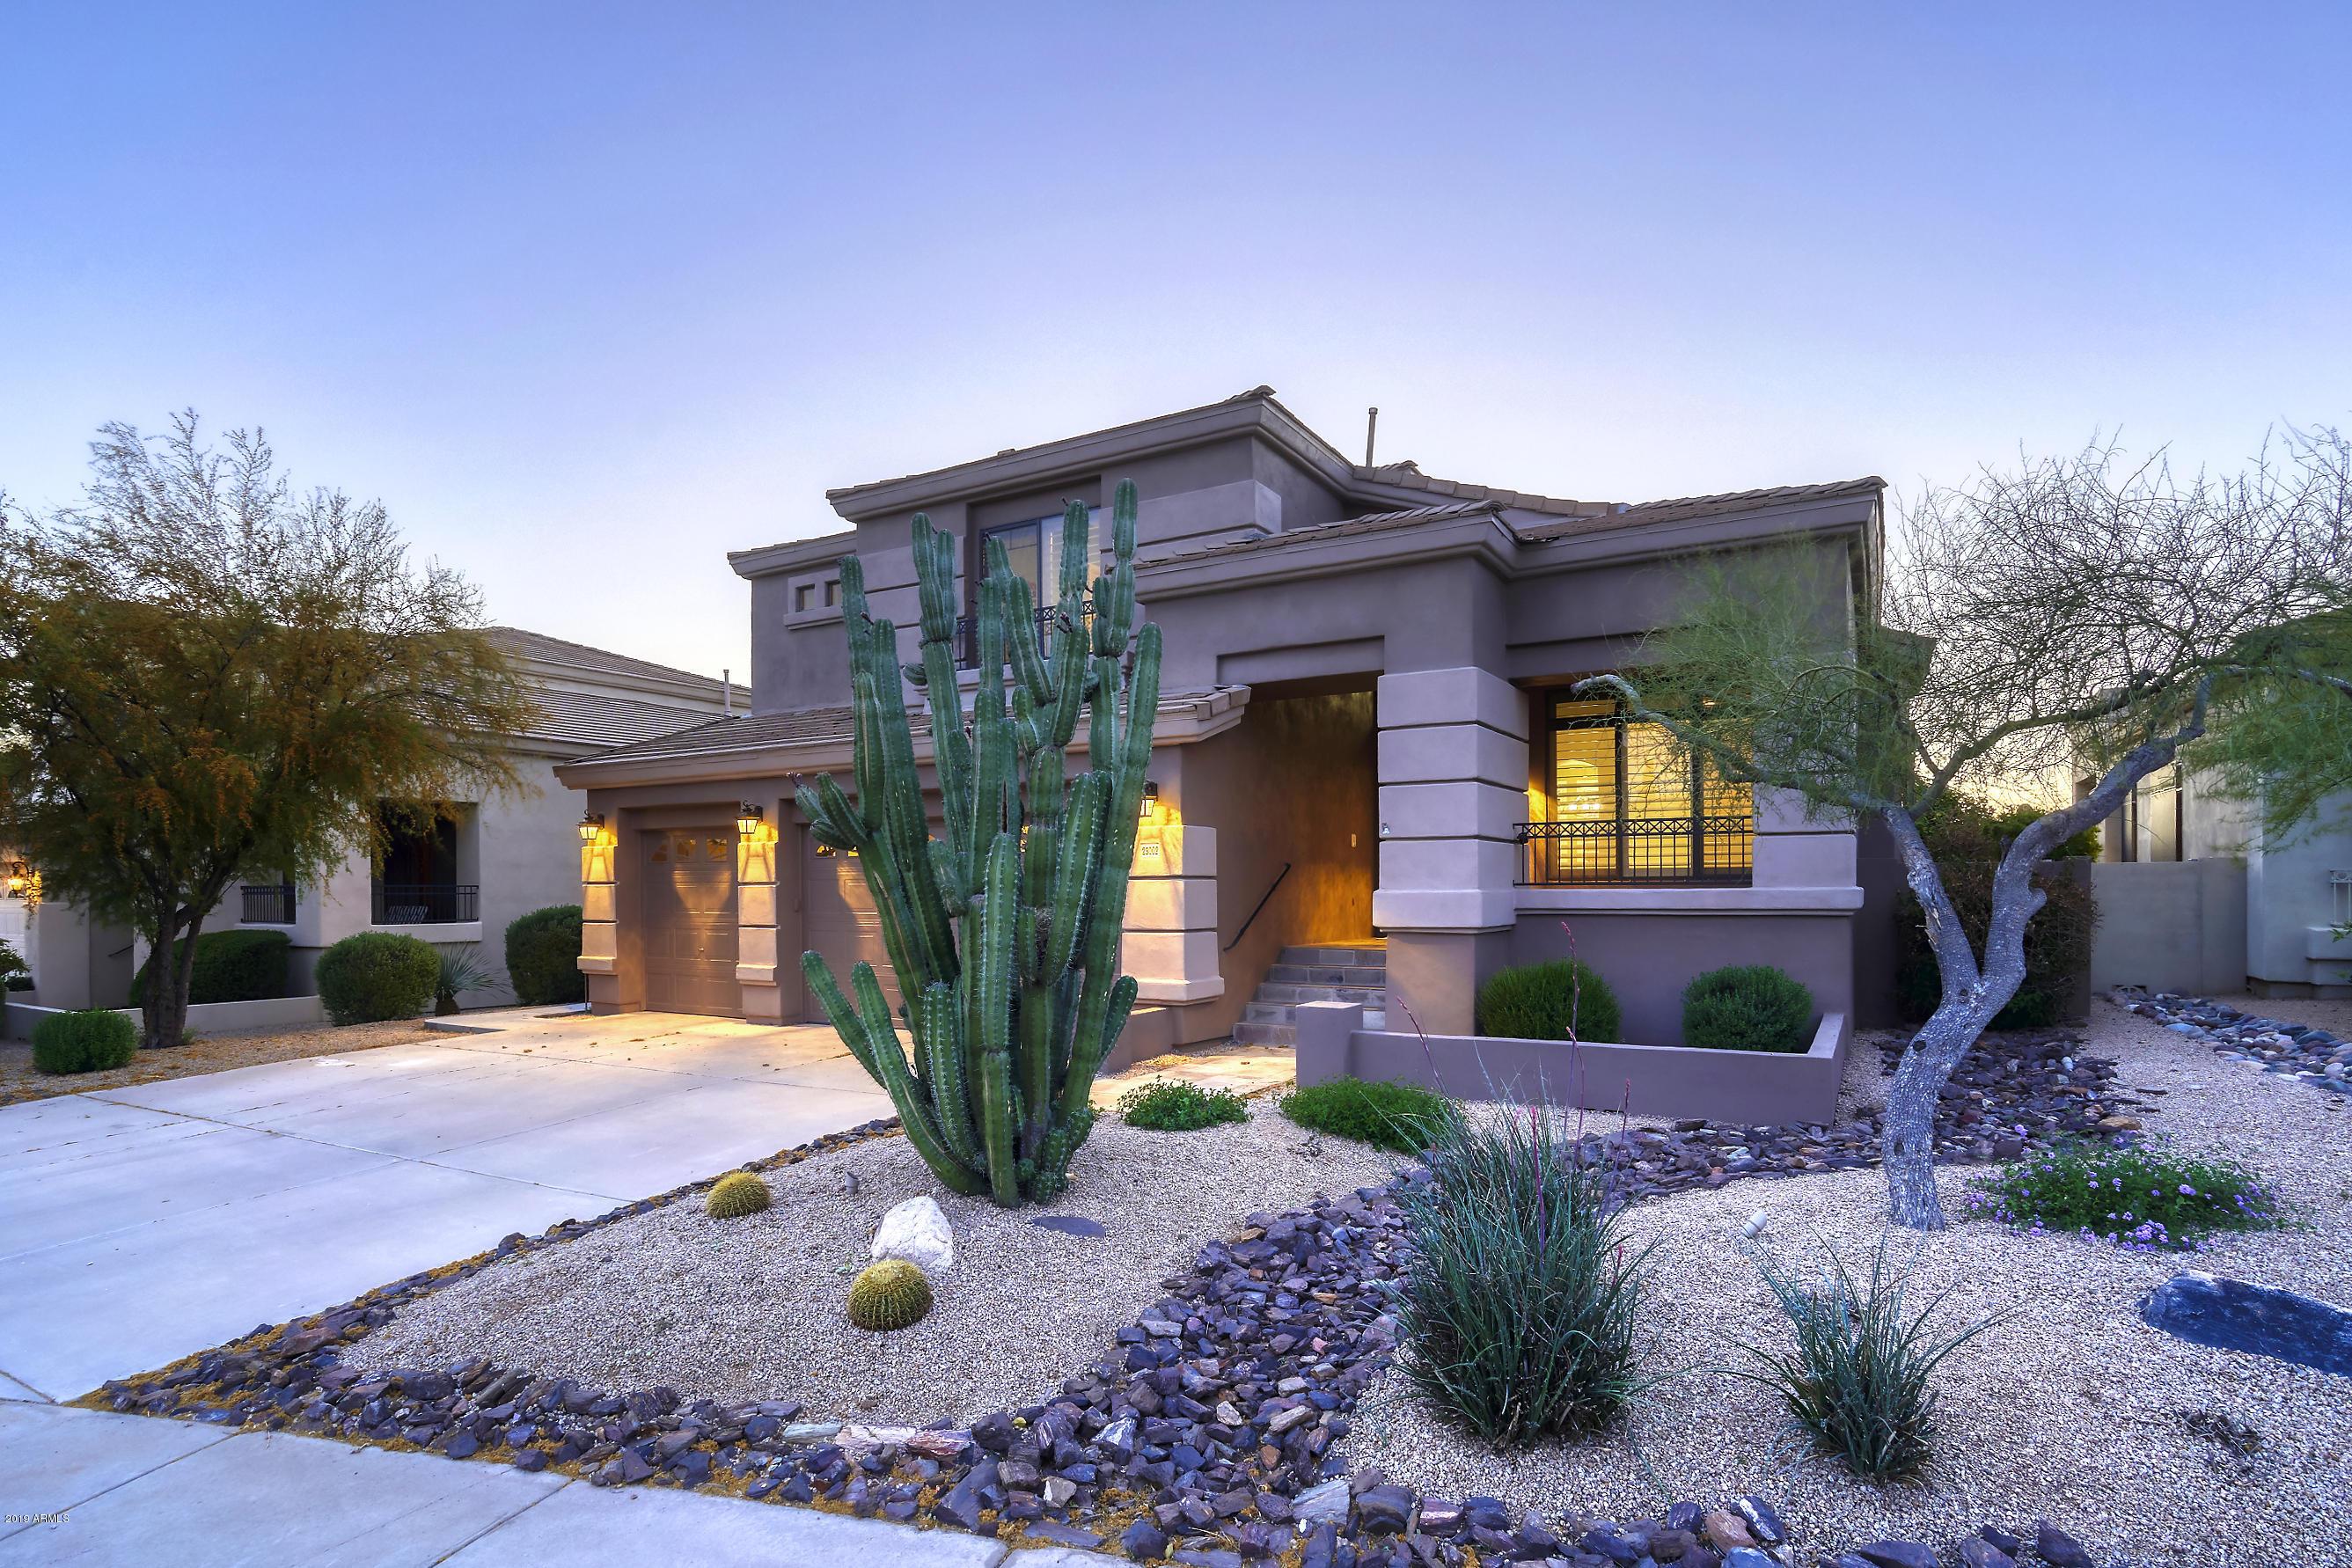 Photo of 23002 N 52ND Street, Phoenix, AZ 85054